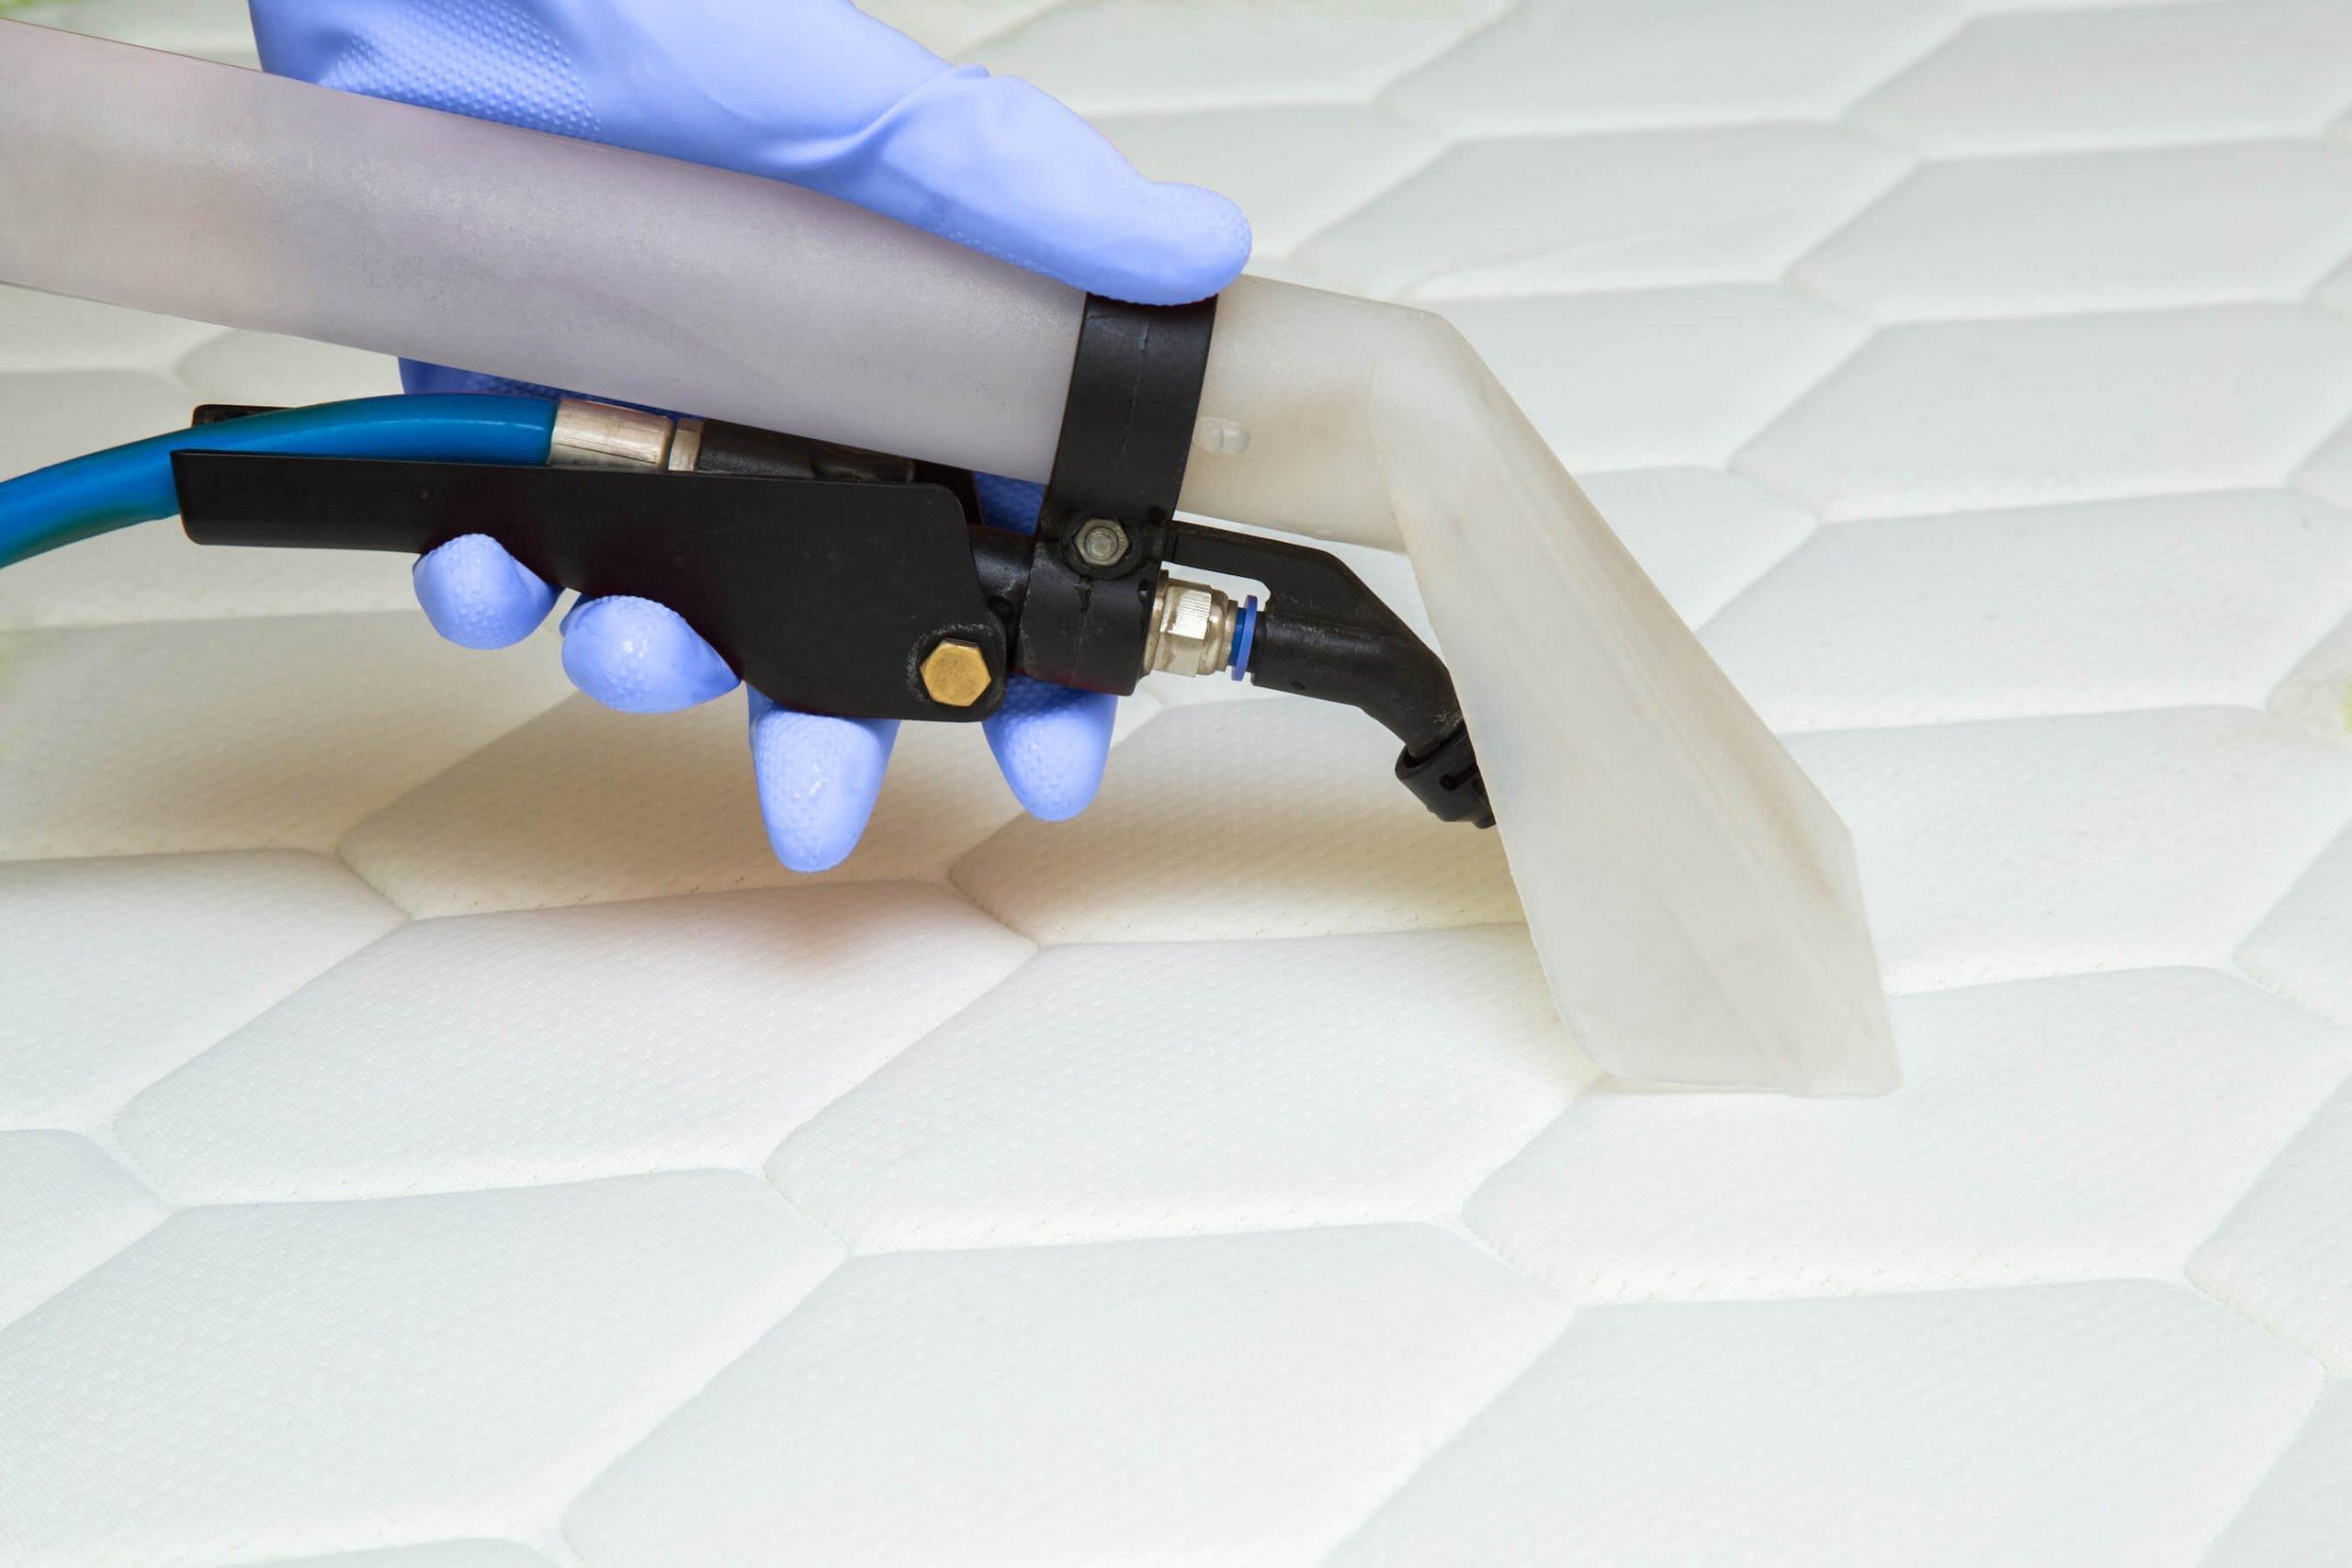 mattress cleaning in Austin, TX